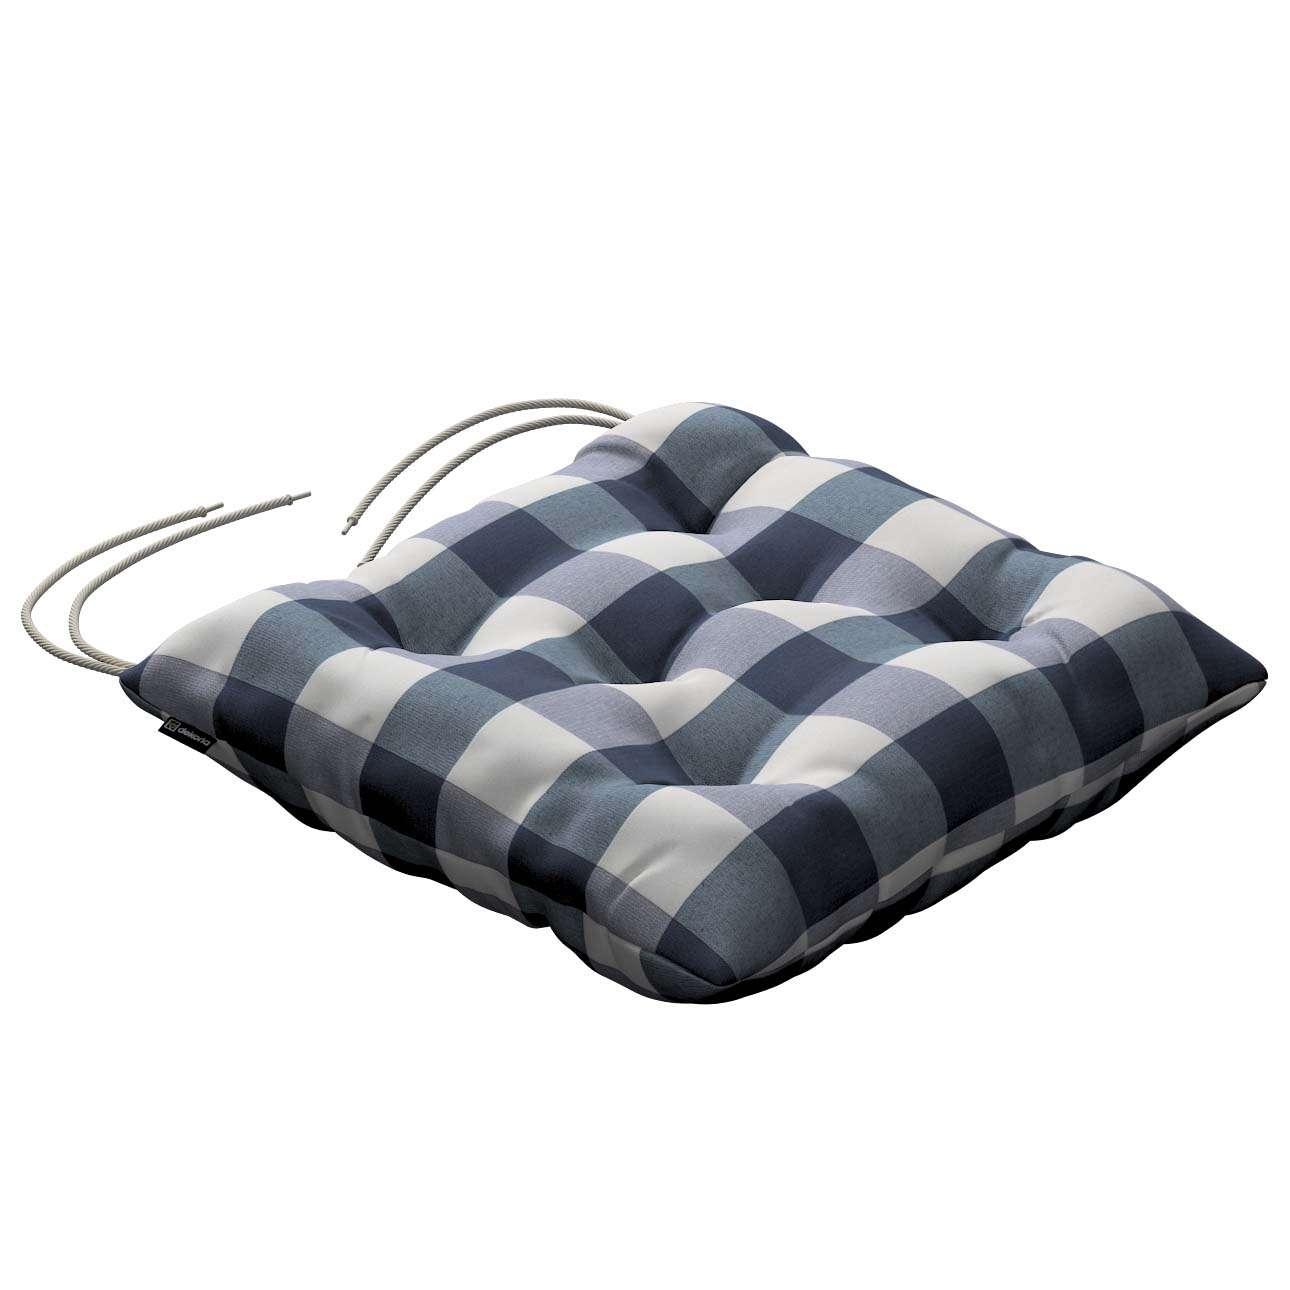 Kėdės pagalvėlė Jacek  40 x 40 x 8 cm kolekcijoje Quadro, audinys: 136-03